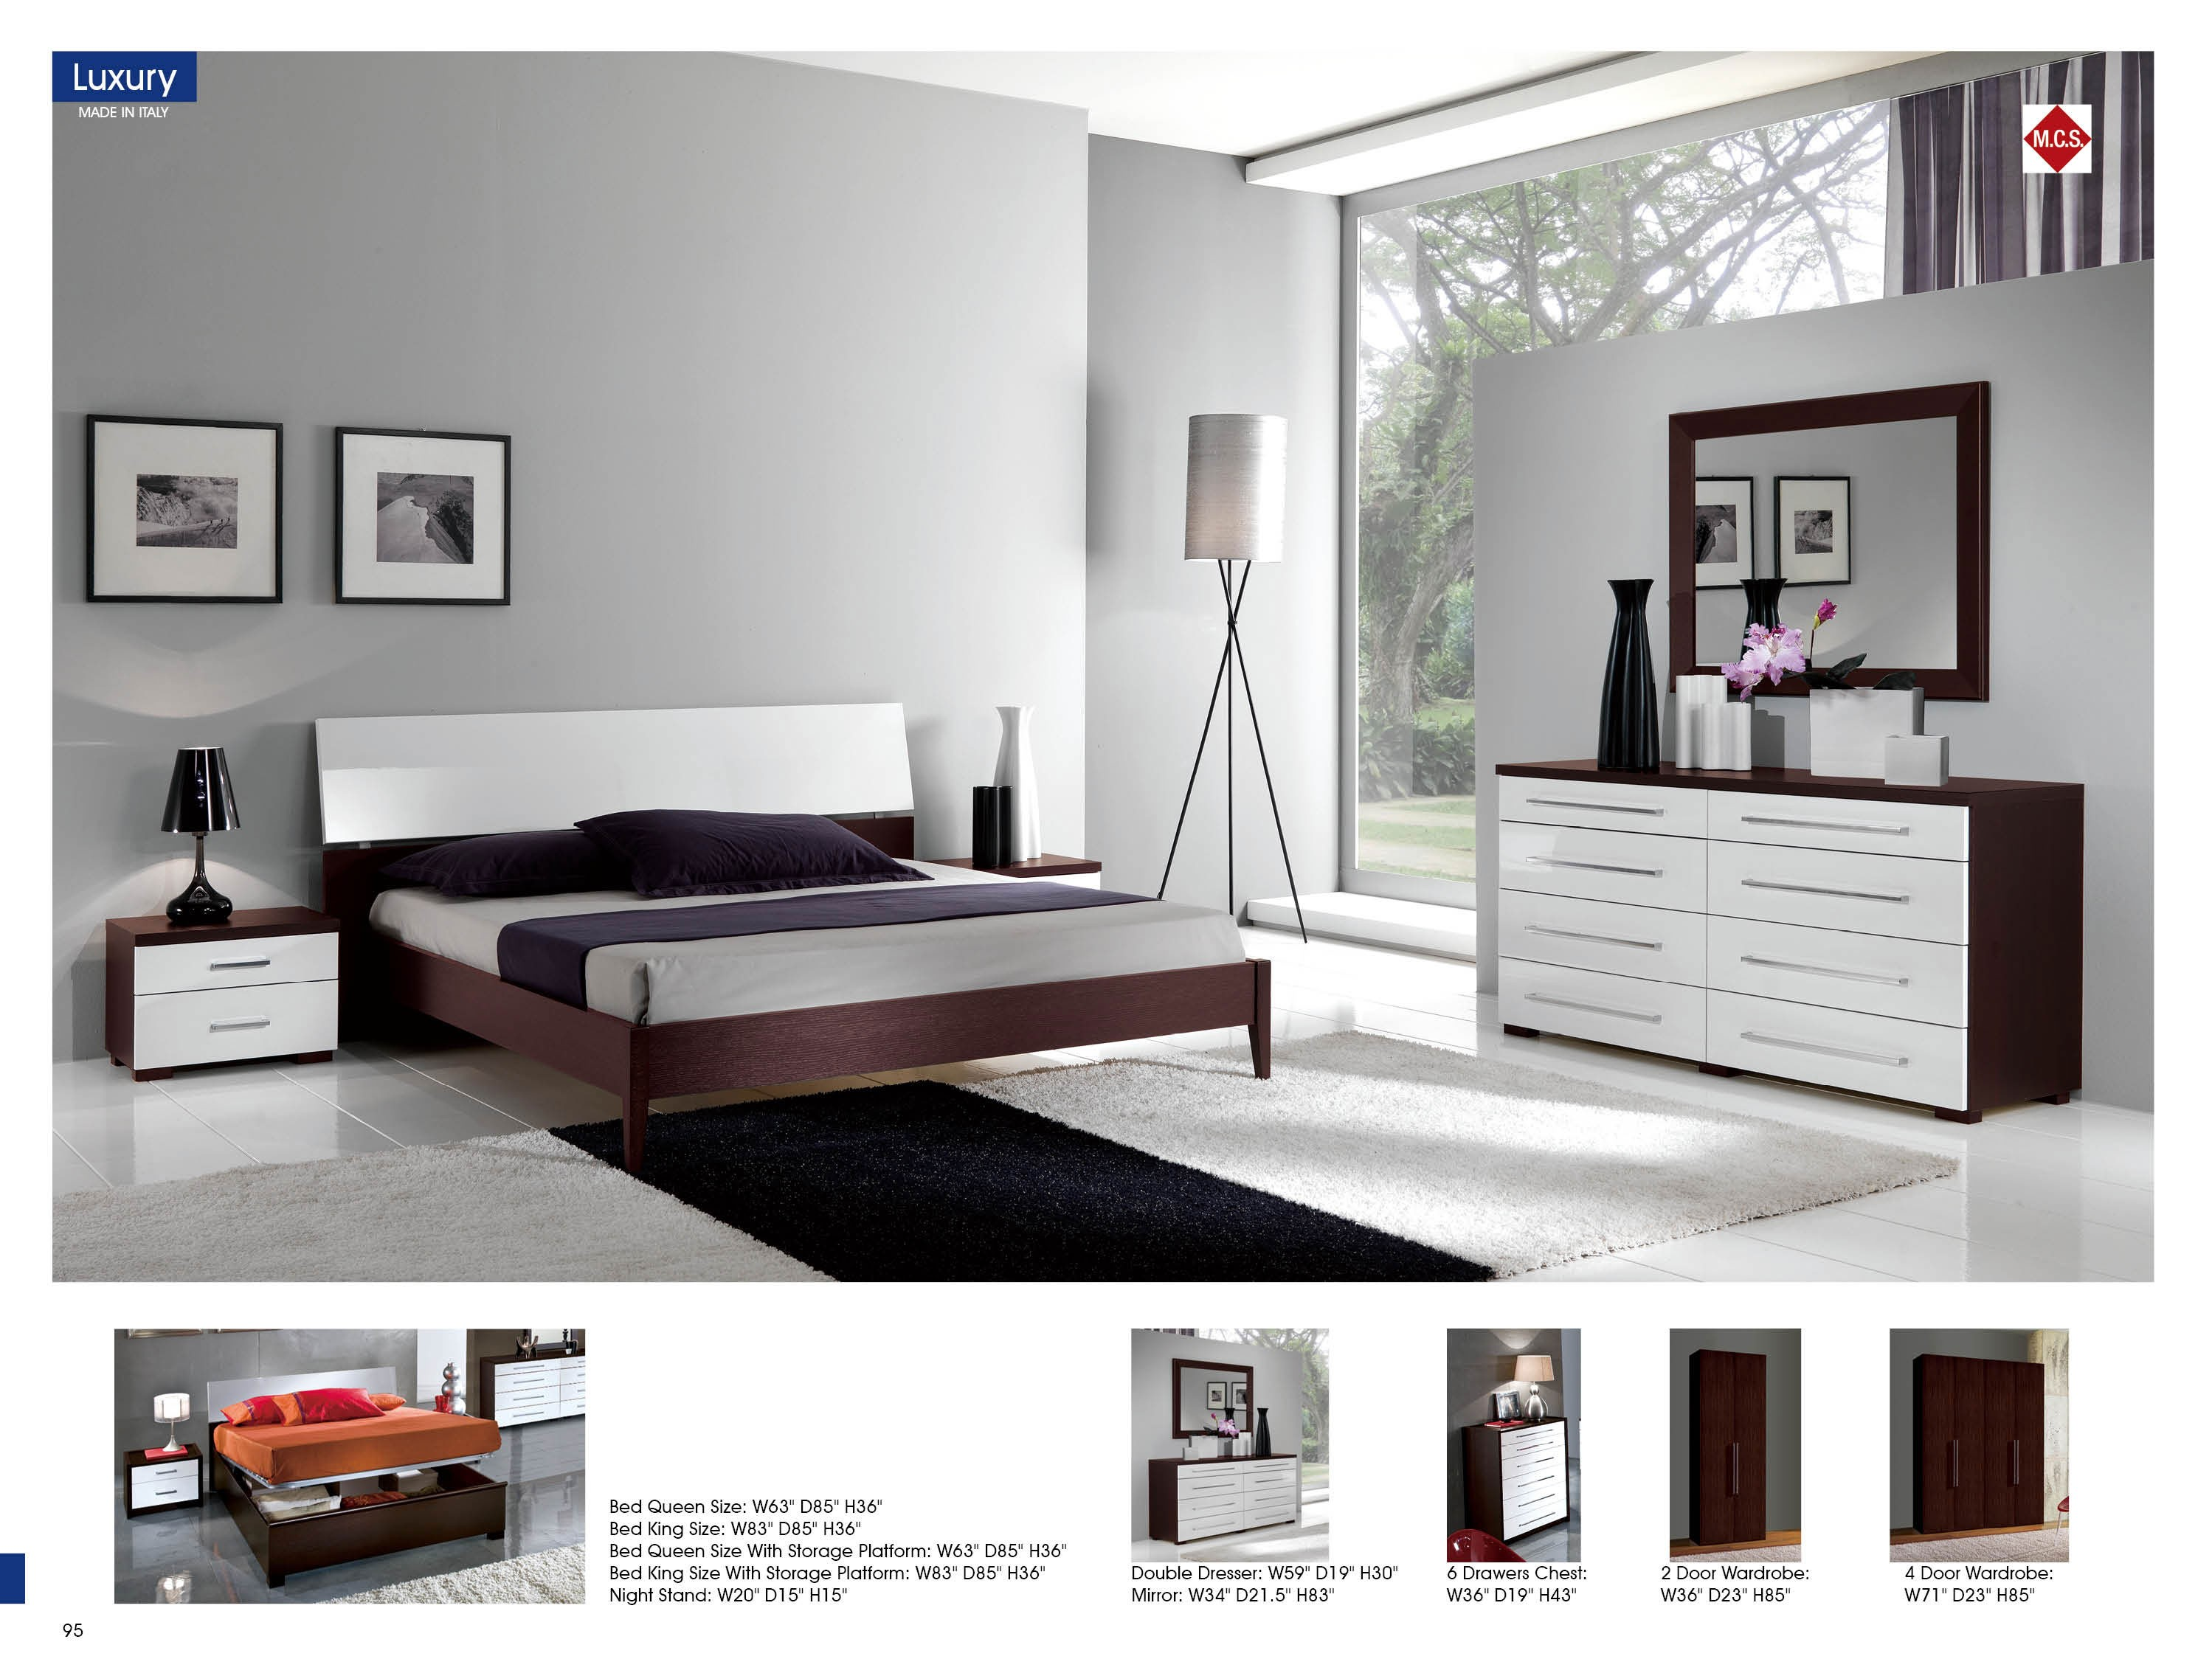 luxury bedroom set made in italy nova interiors. Black Bedroom Furniture Sets. Home Design Ideas